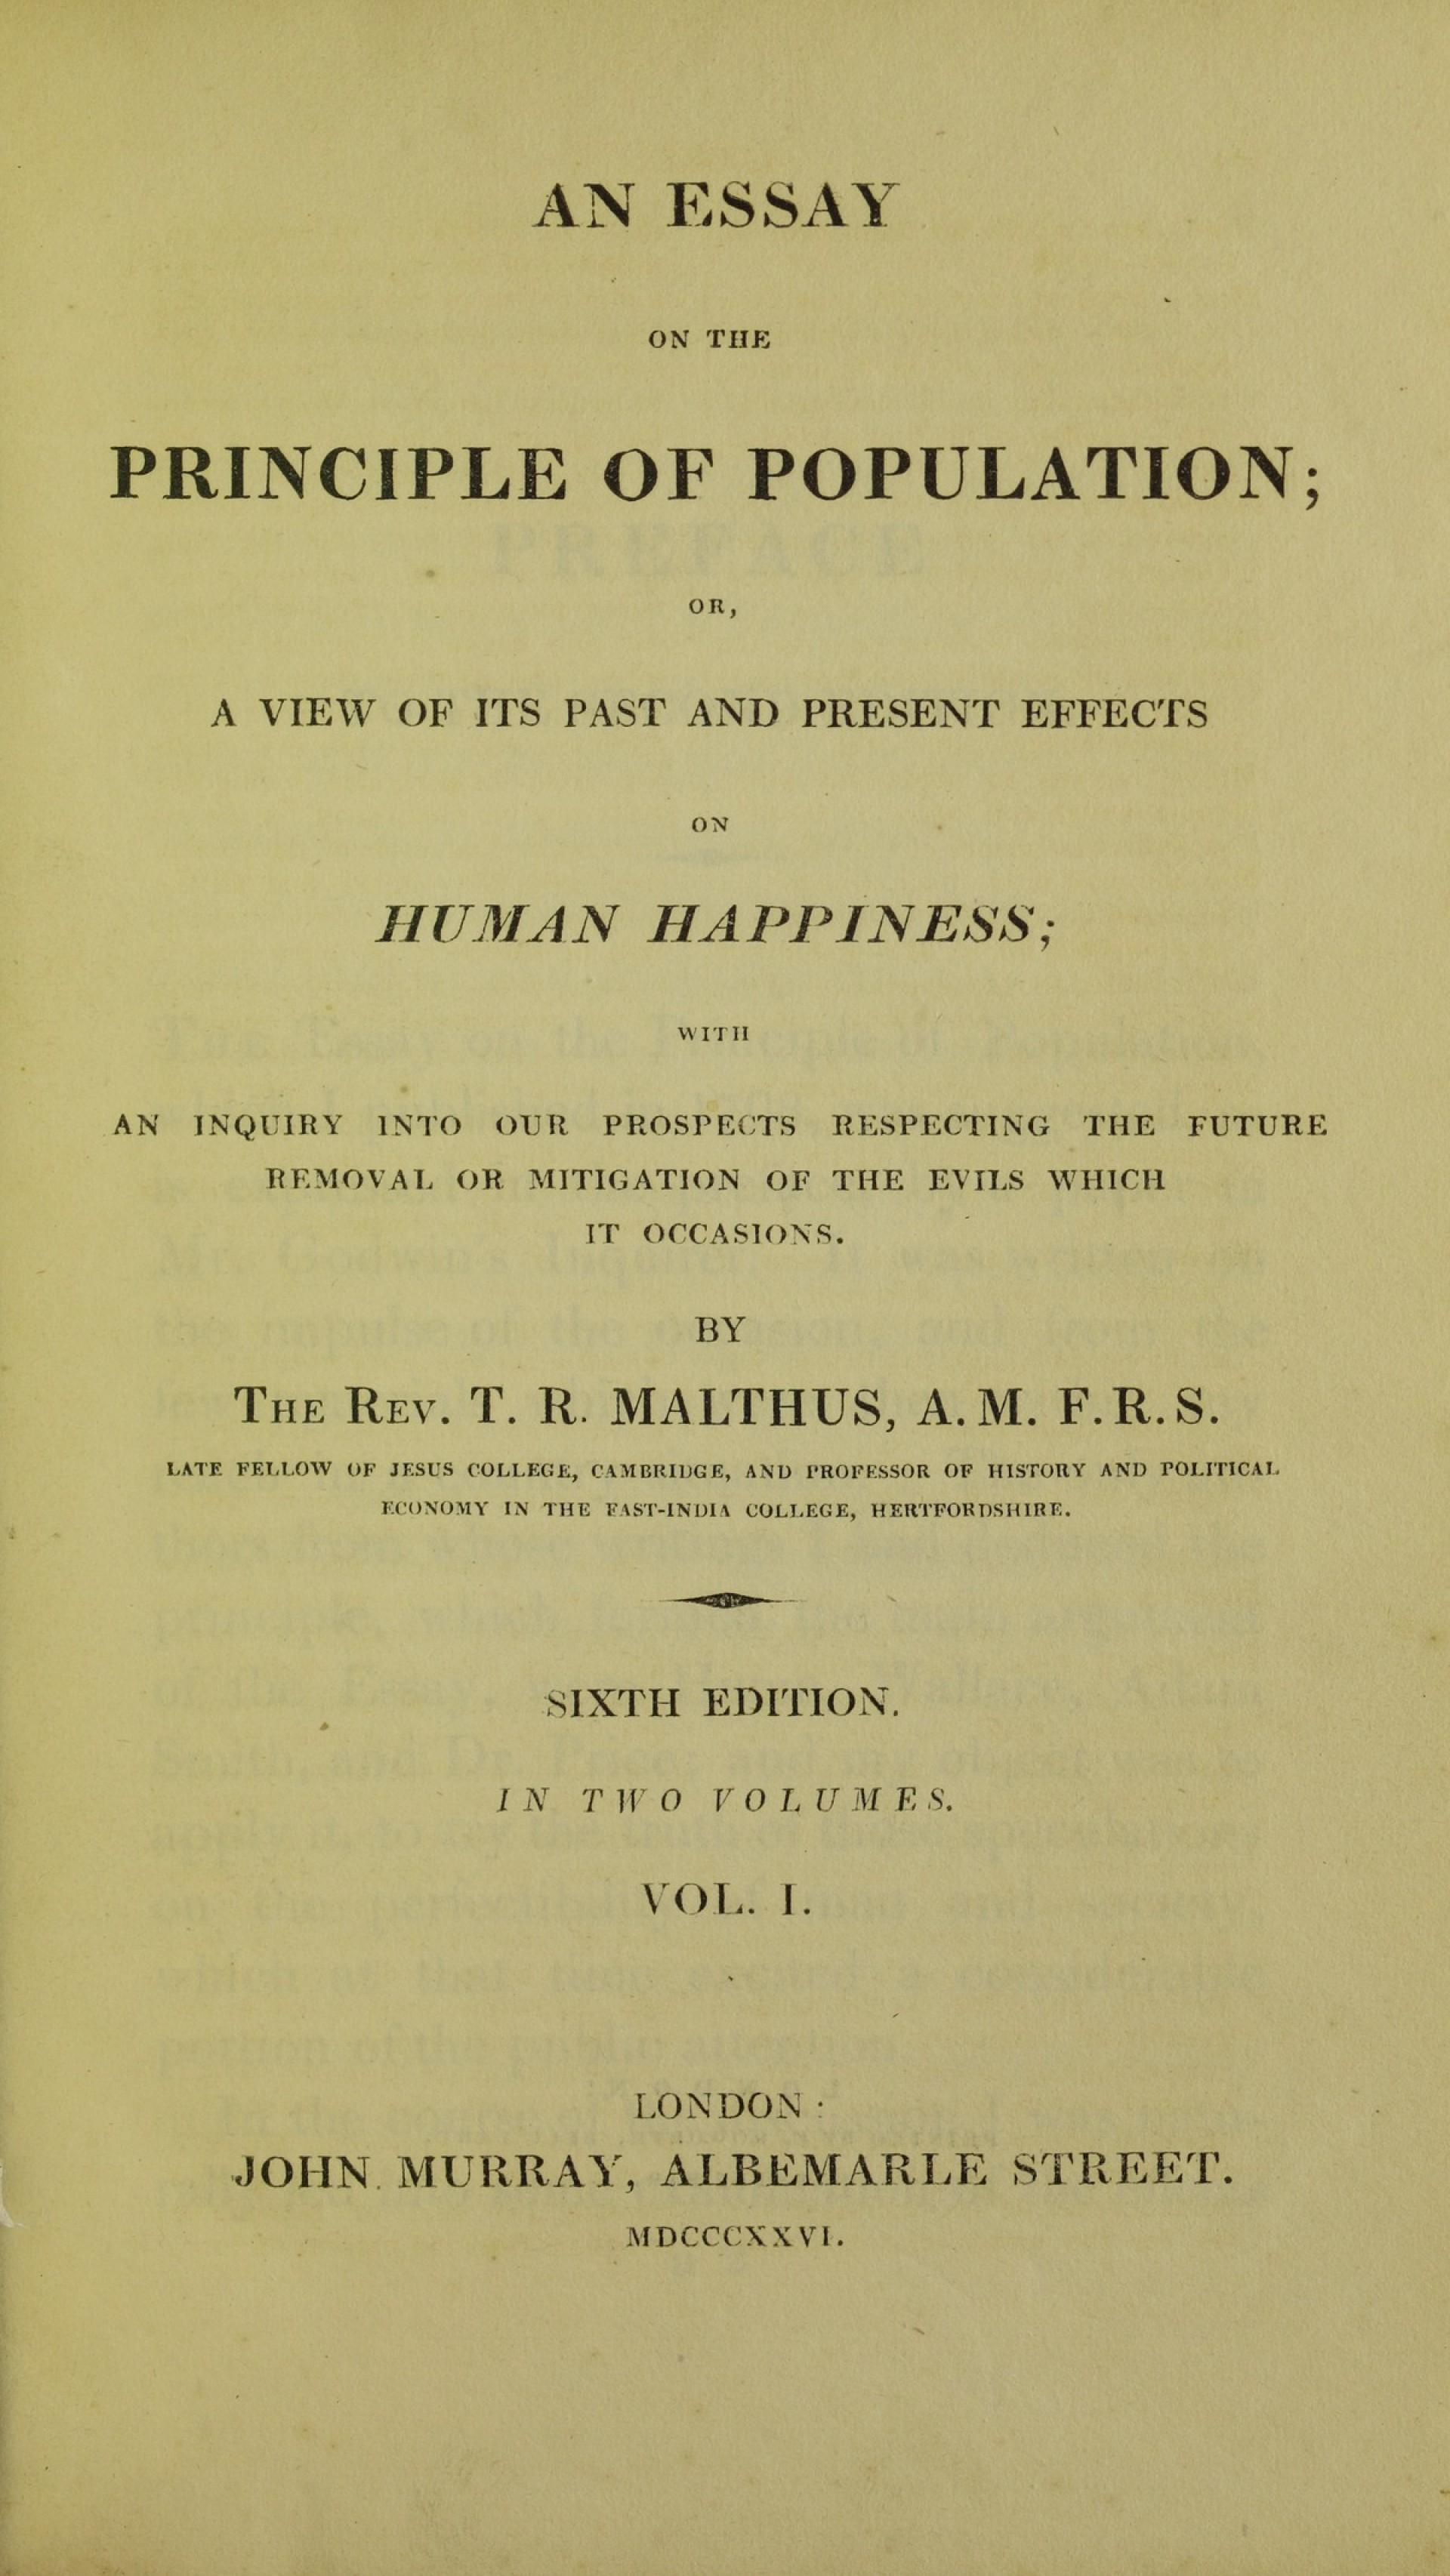 005 Thomas Malthus Essay On The Principle Of Population Lossy Page1 1200px  Population2c 1826 5884843 Tif Stupendous After Reading Malthus's Principles Darwin Got Idea That Ap Euro1920